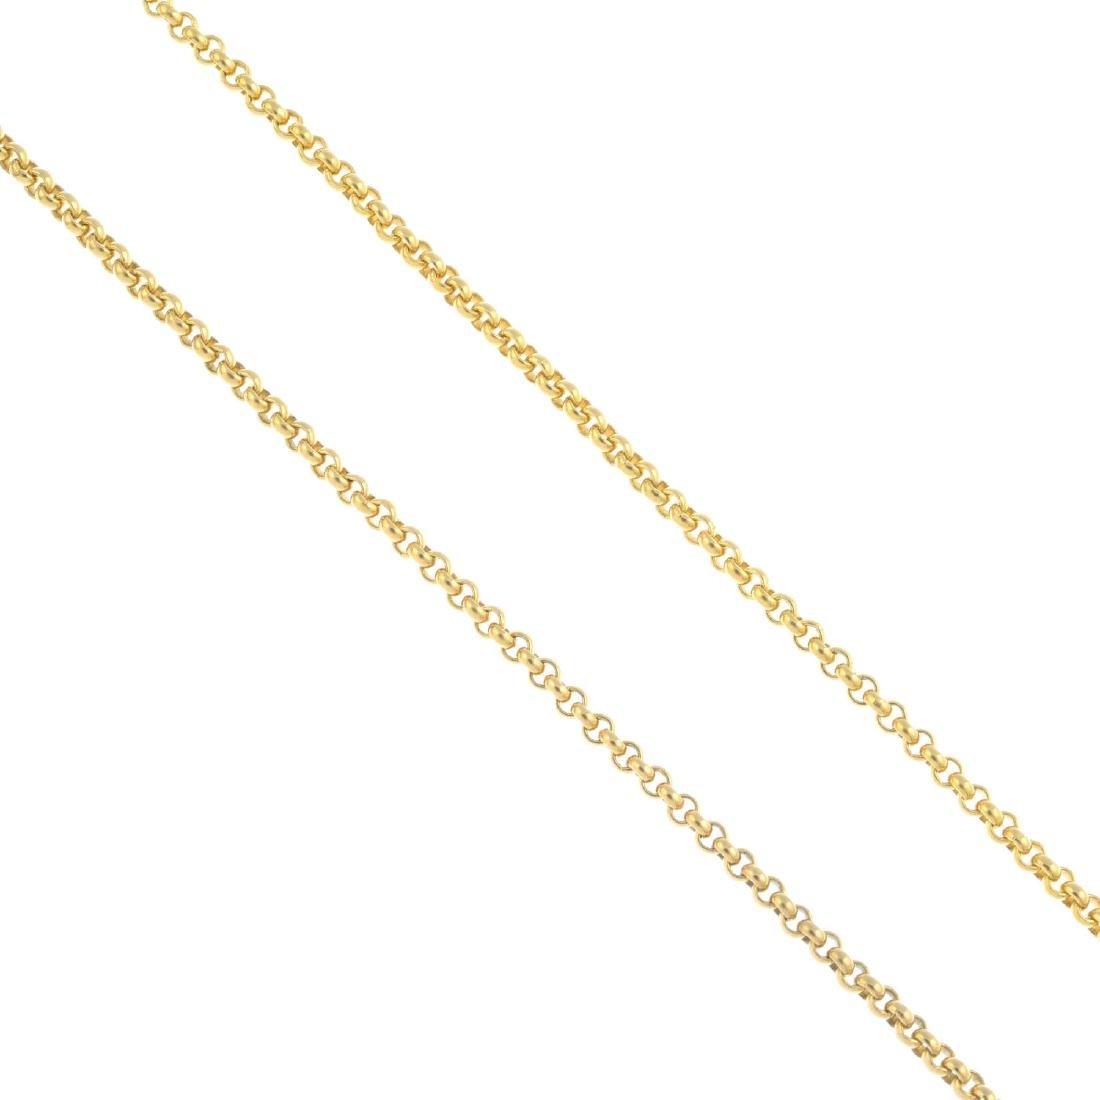 CHOPARD - an 18ct gold necklace. The belcher-link